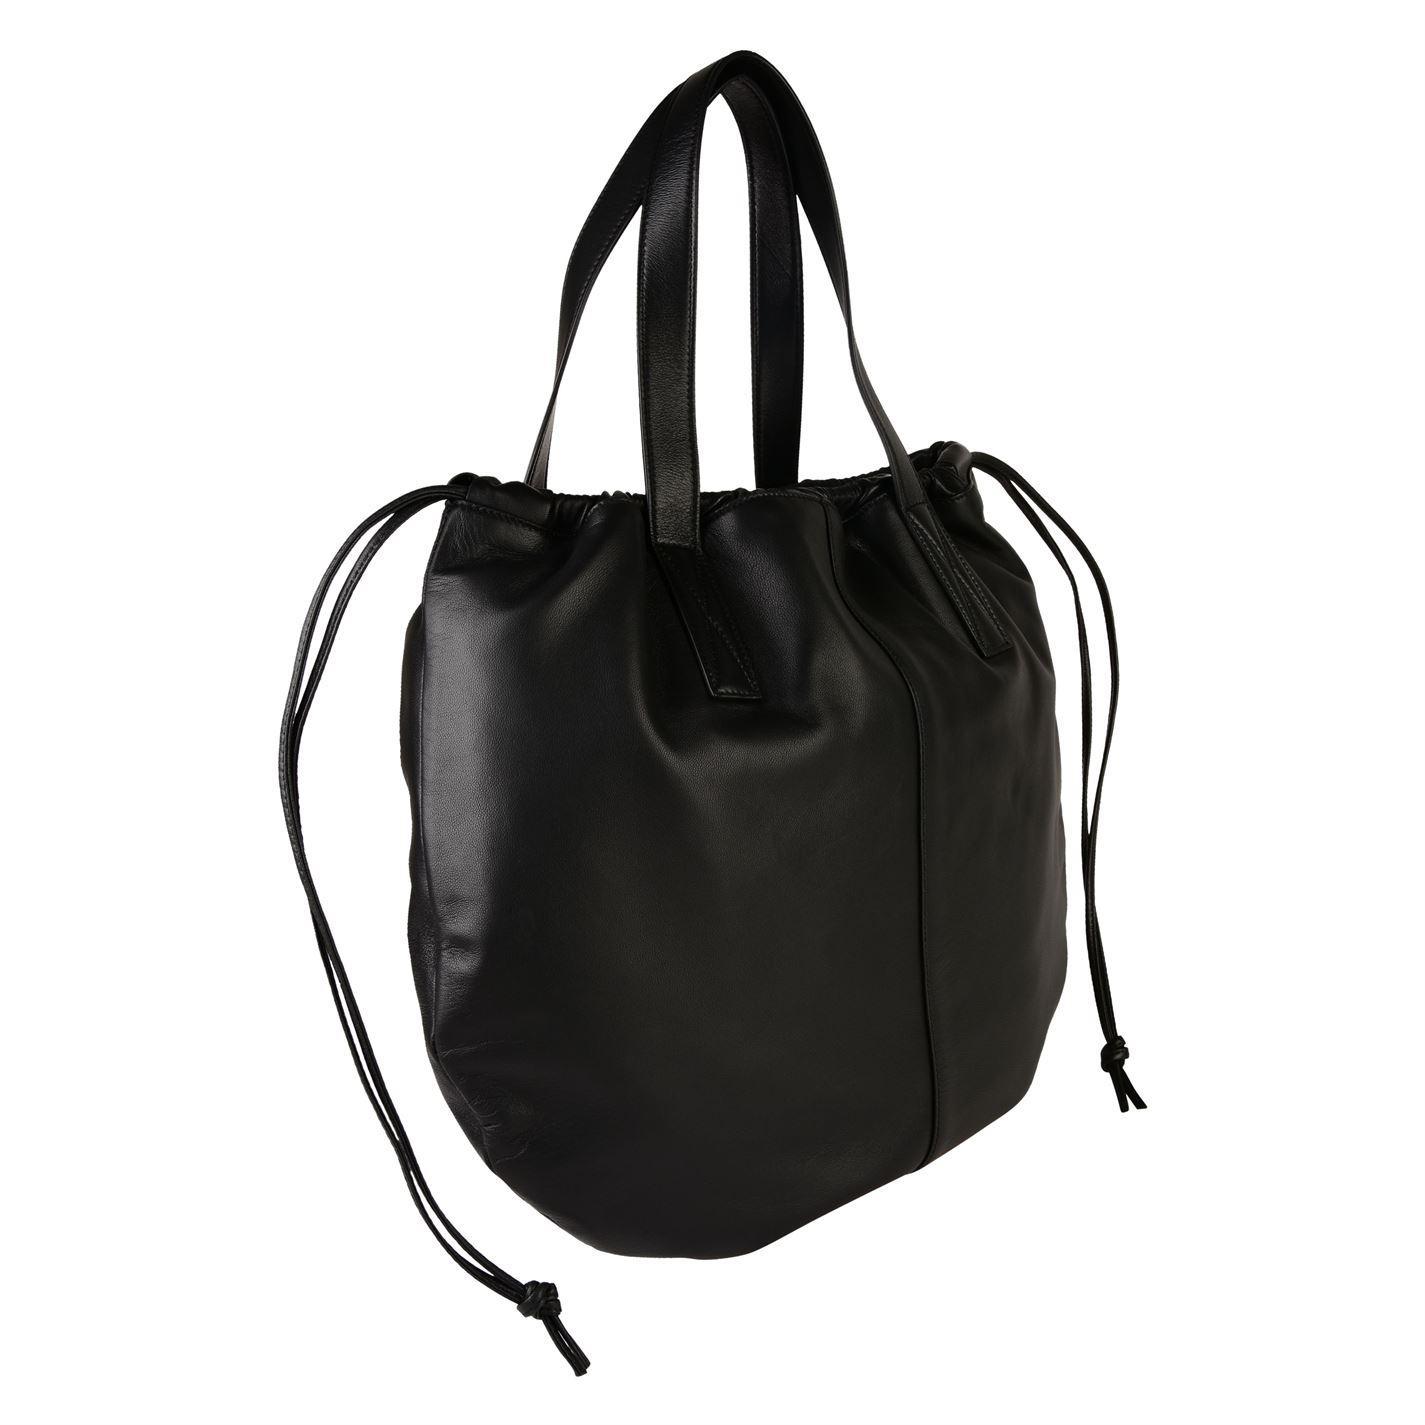 Victoria Beckham Leather Lea Tote Bag in Black